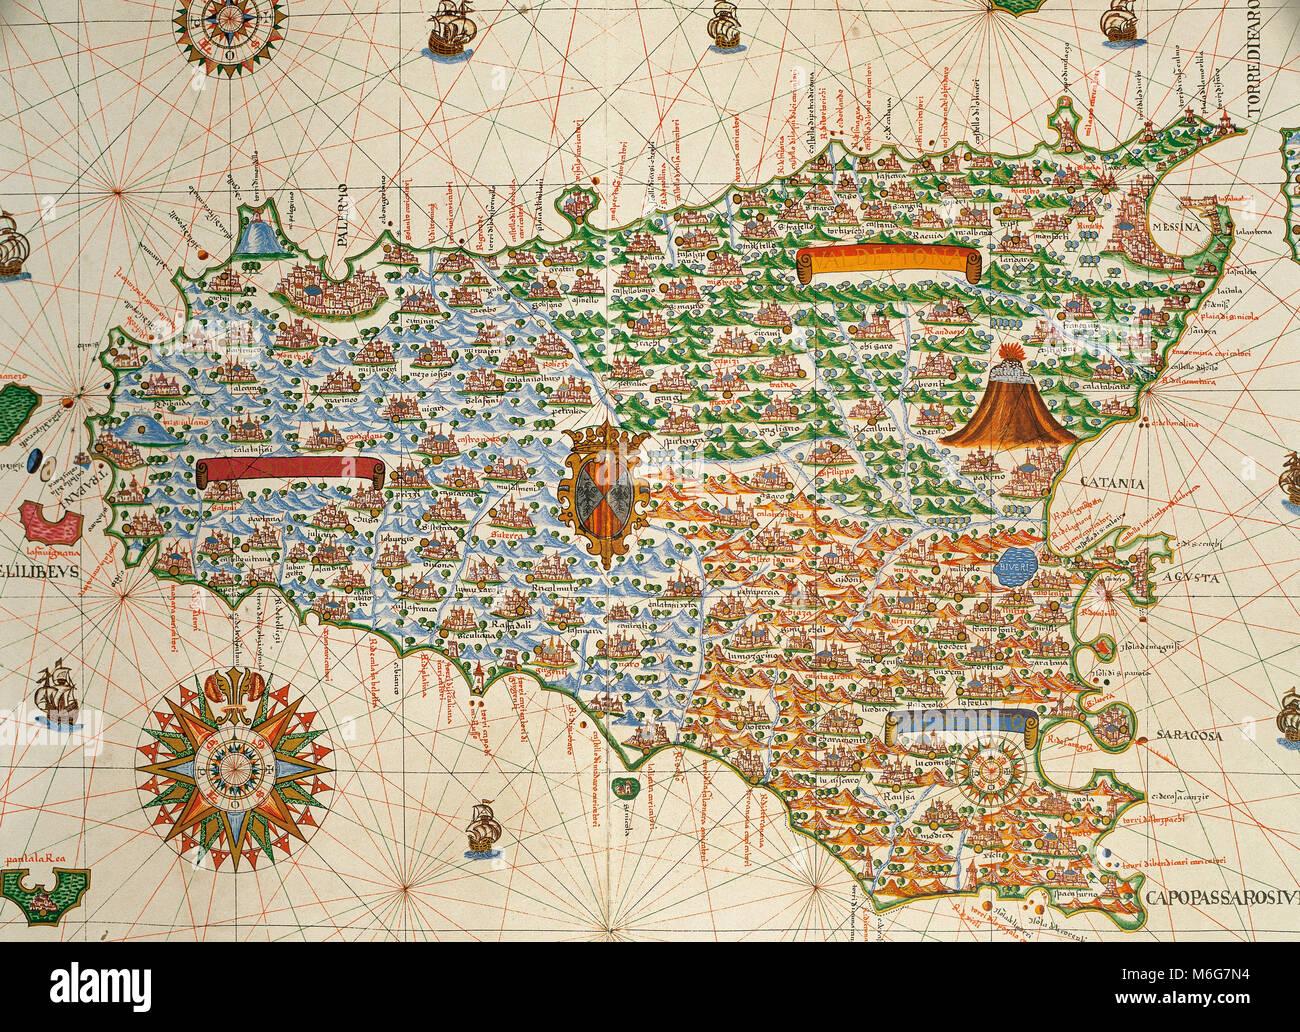 Island of Sicily. Portolan chart by Joan Martines, Spanish cartographer of the Majorcan cartographic school (16th - Stock Image